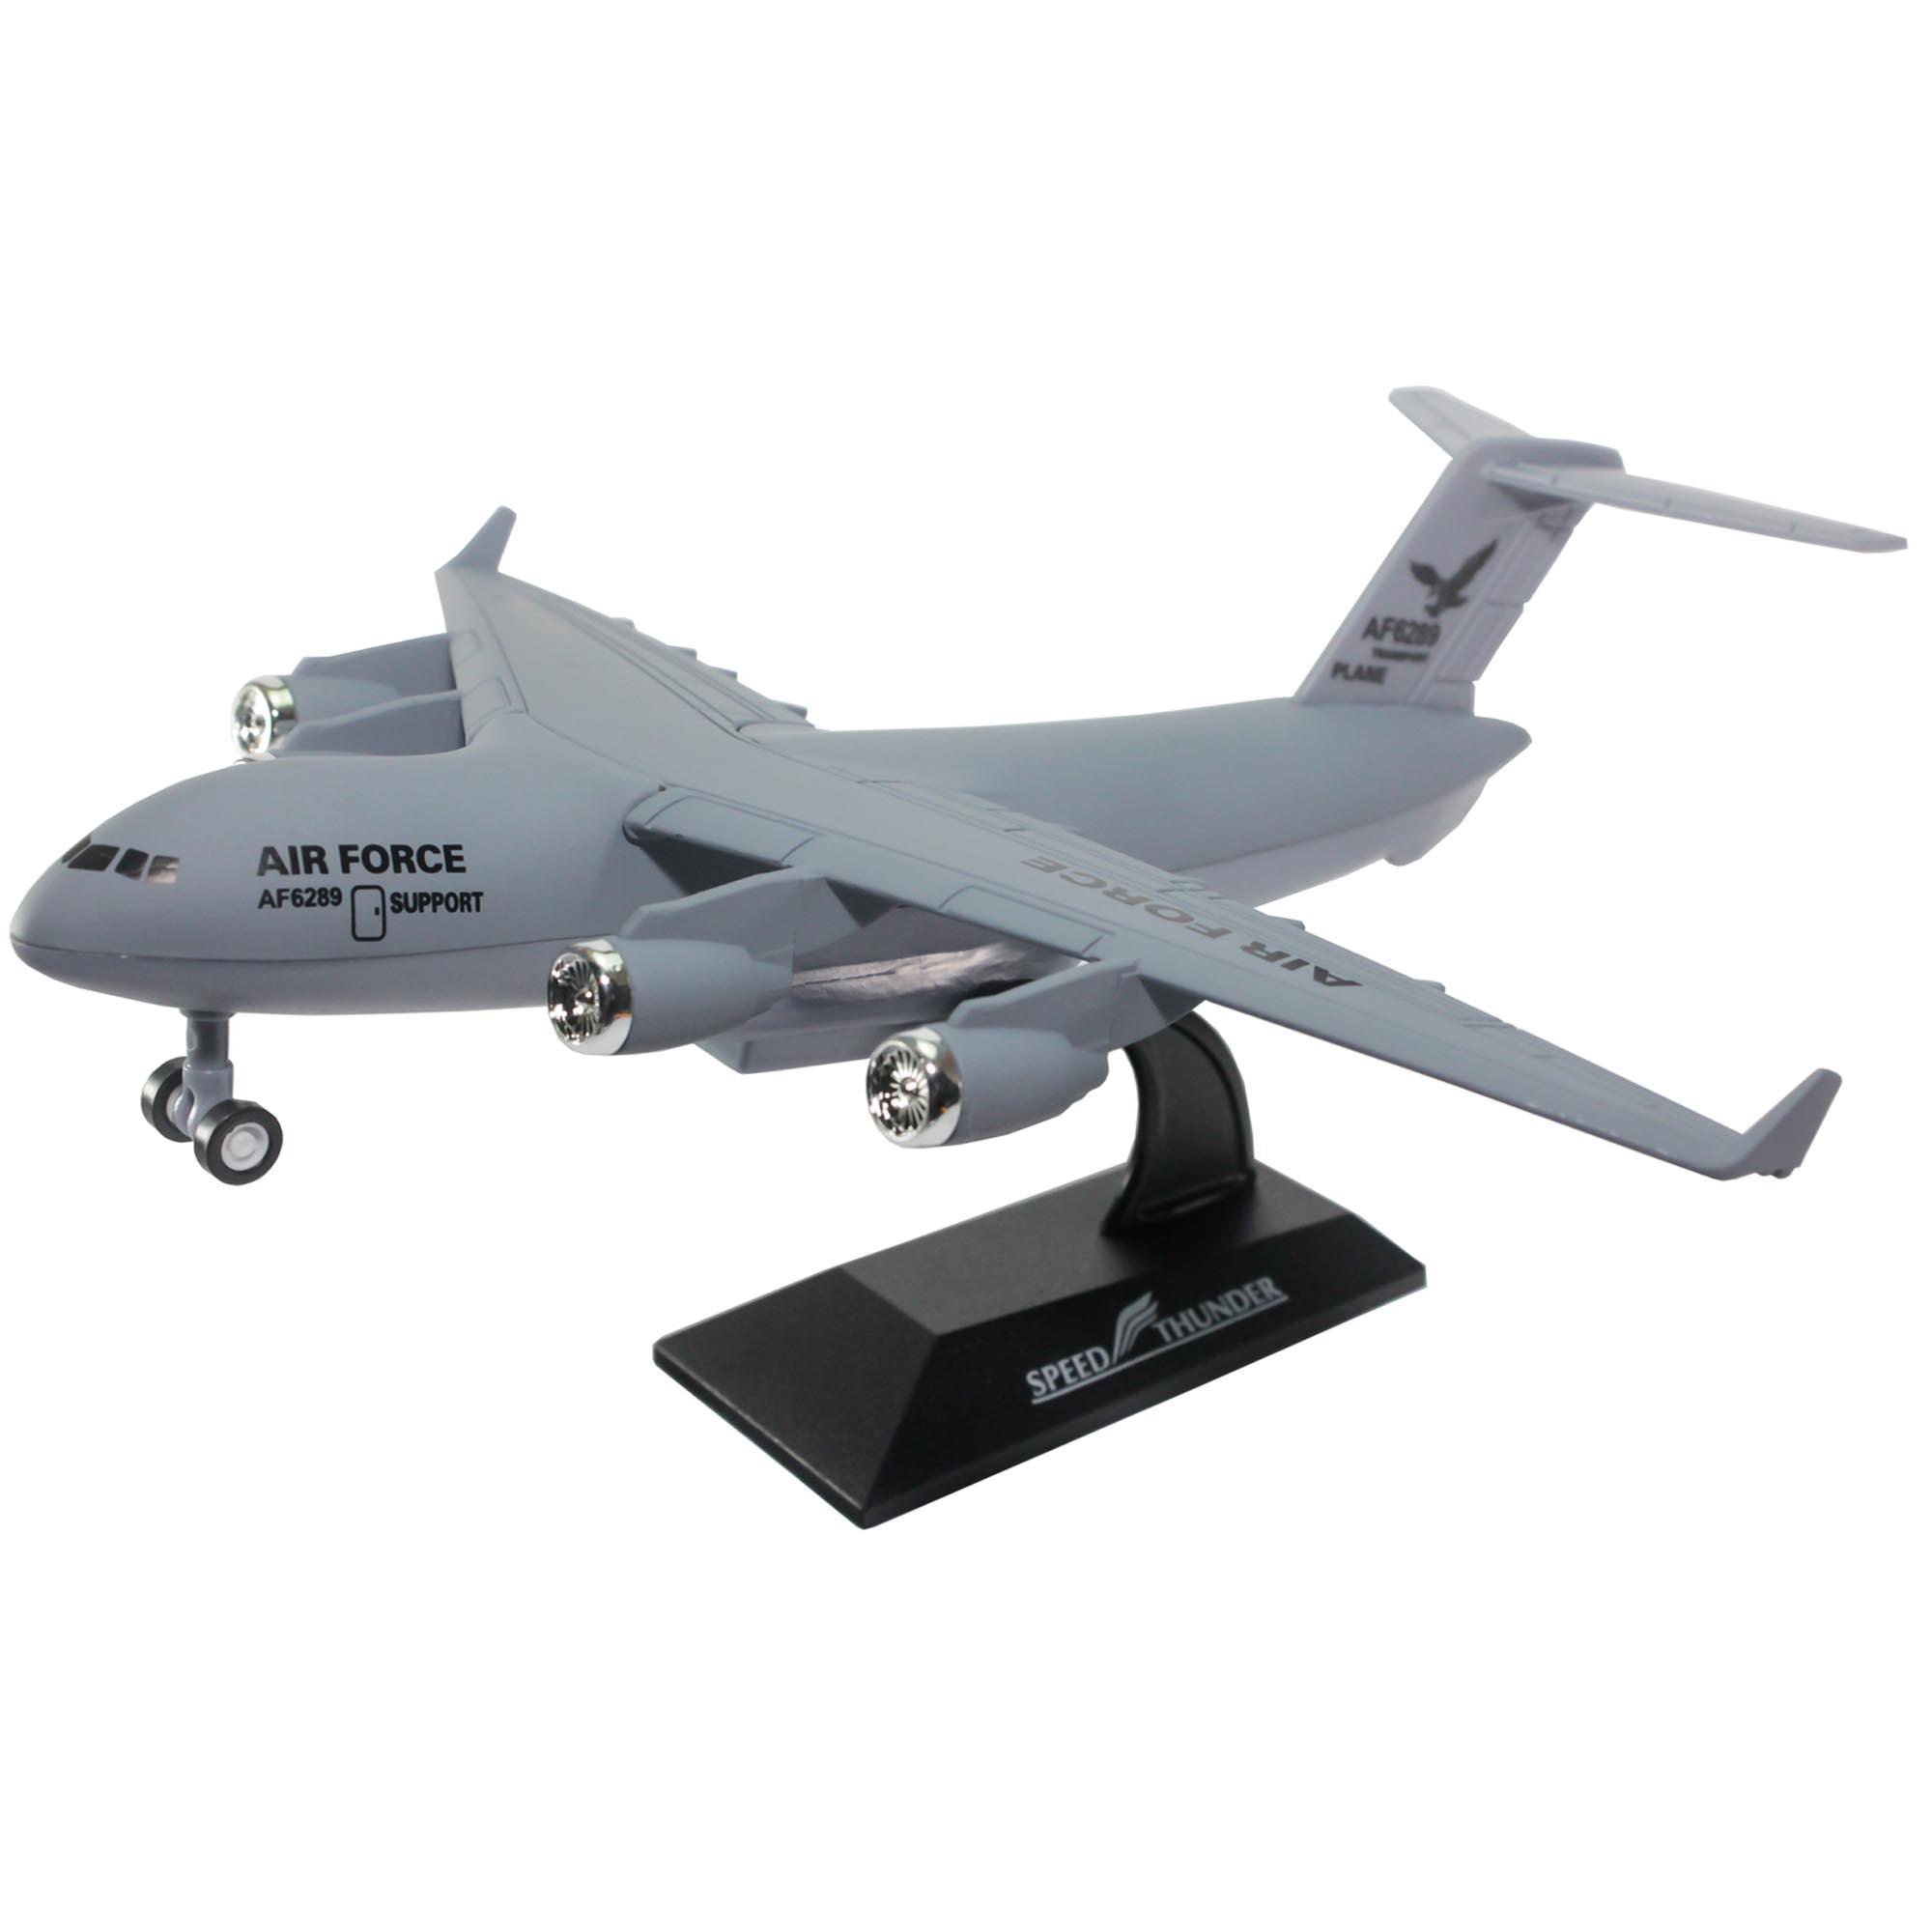 Speed Thunder 1300 Die Cast C 17 T End 2 11 2020 1025 Am 04 Pesawat Remote Kontrol Transport Plane Air Force Grey